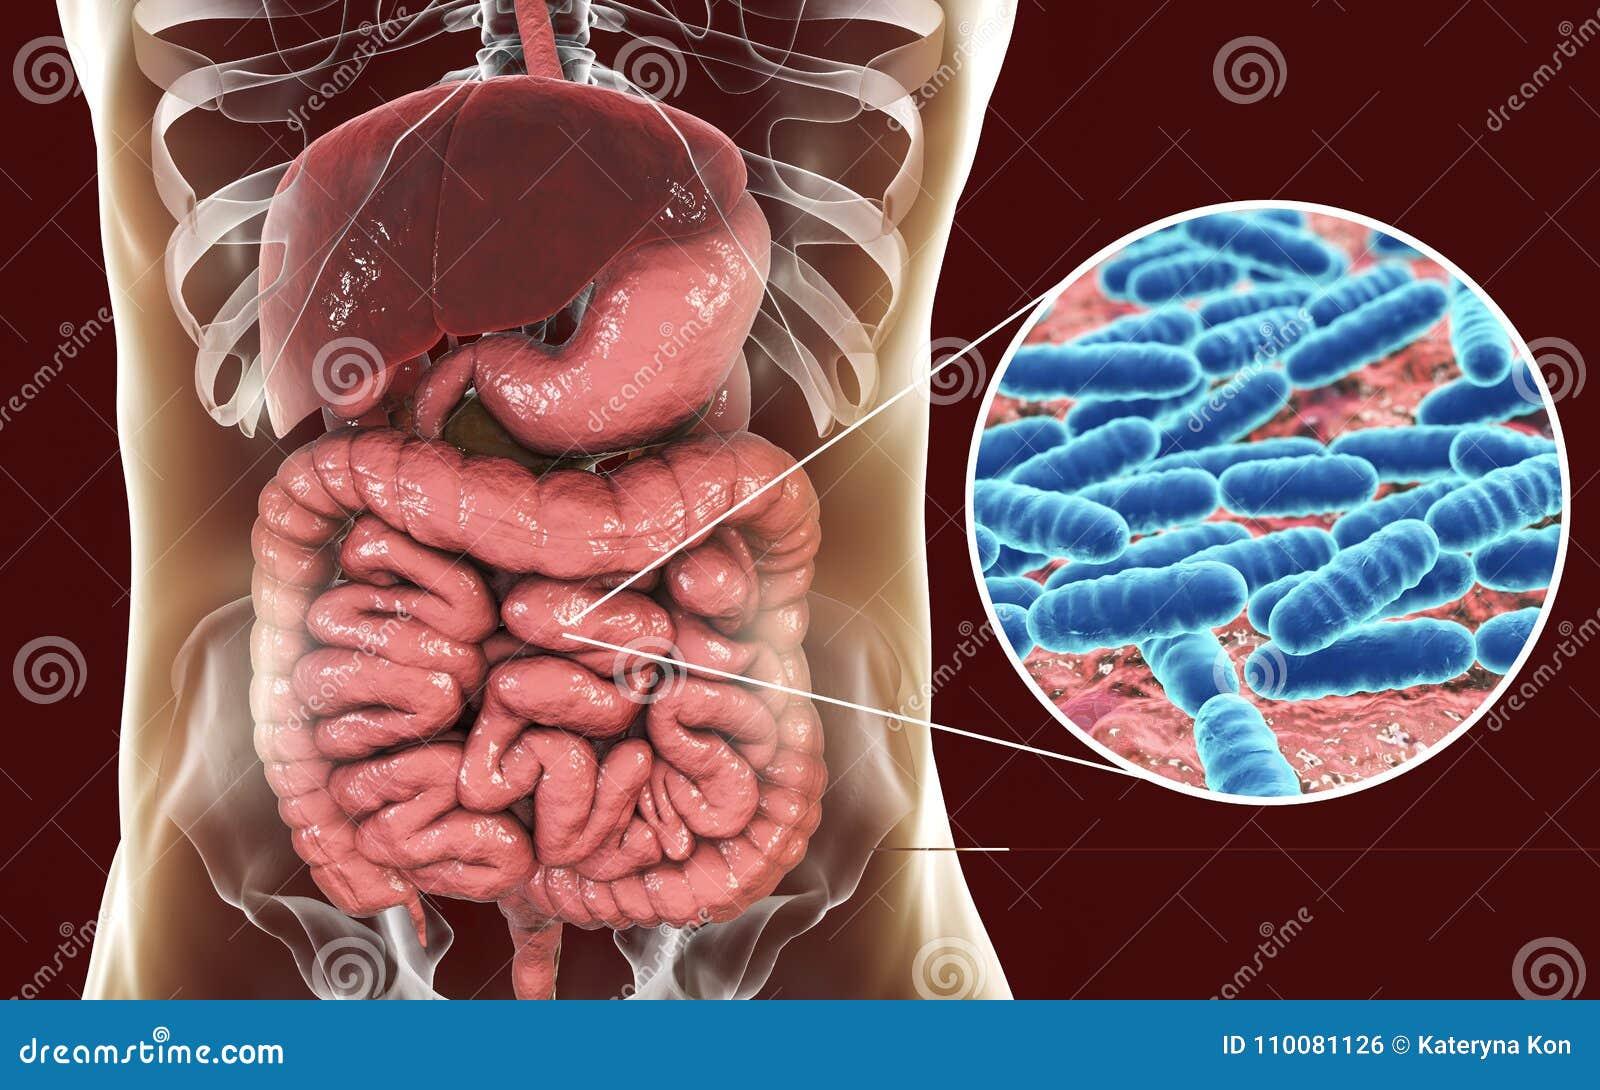 Normal Flora Of Small Intestine  Bacteria Lactobacillus